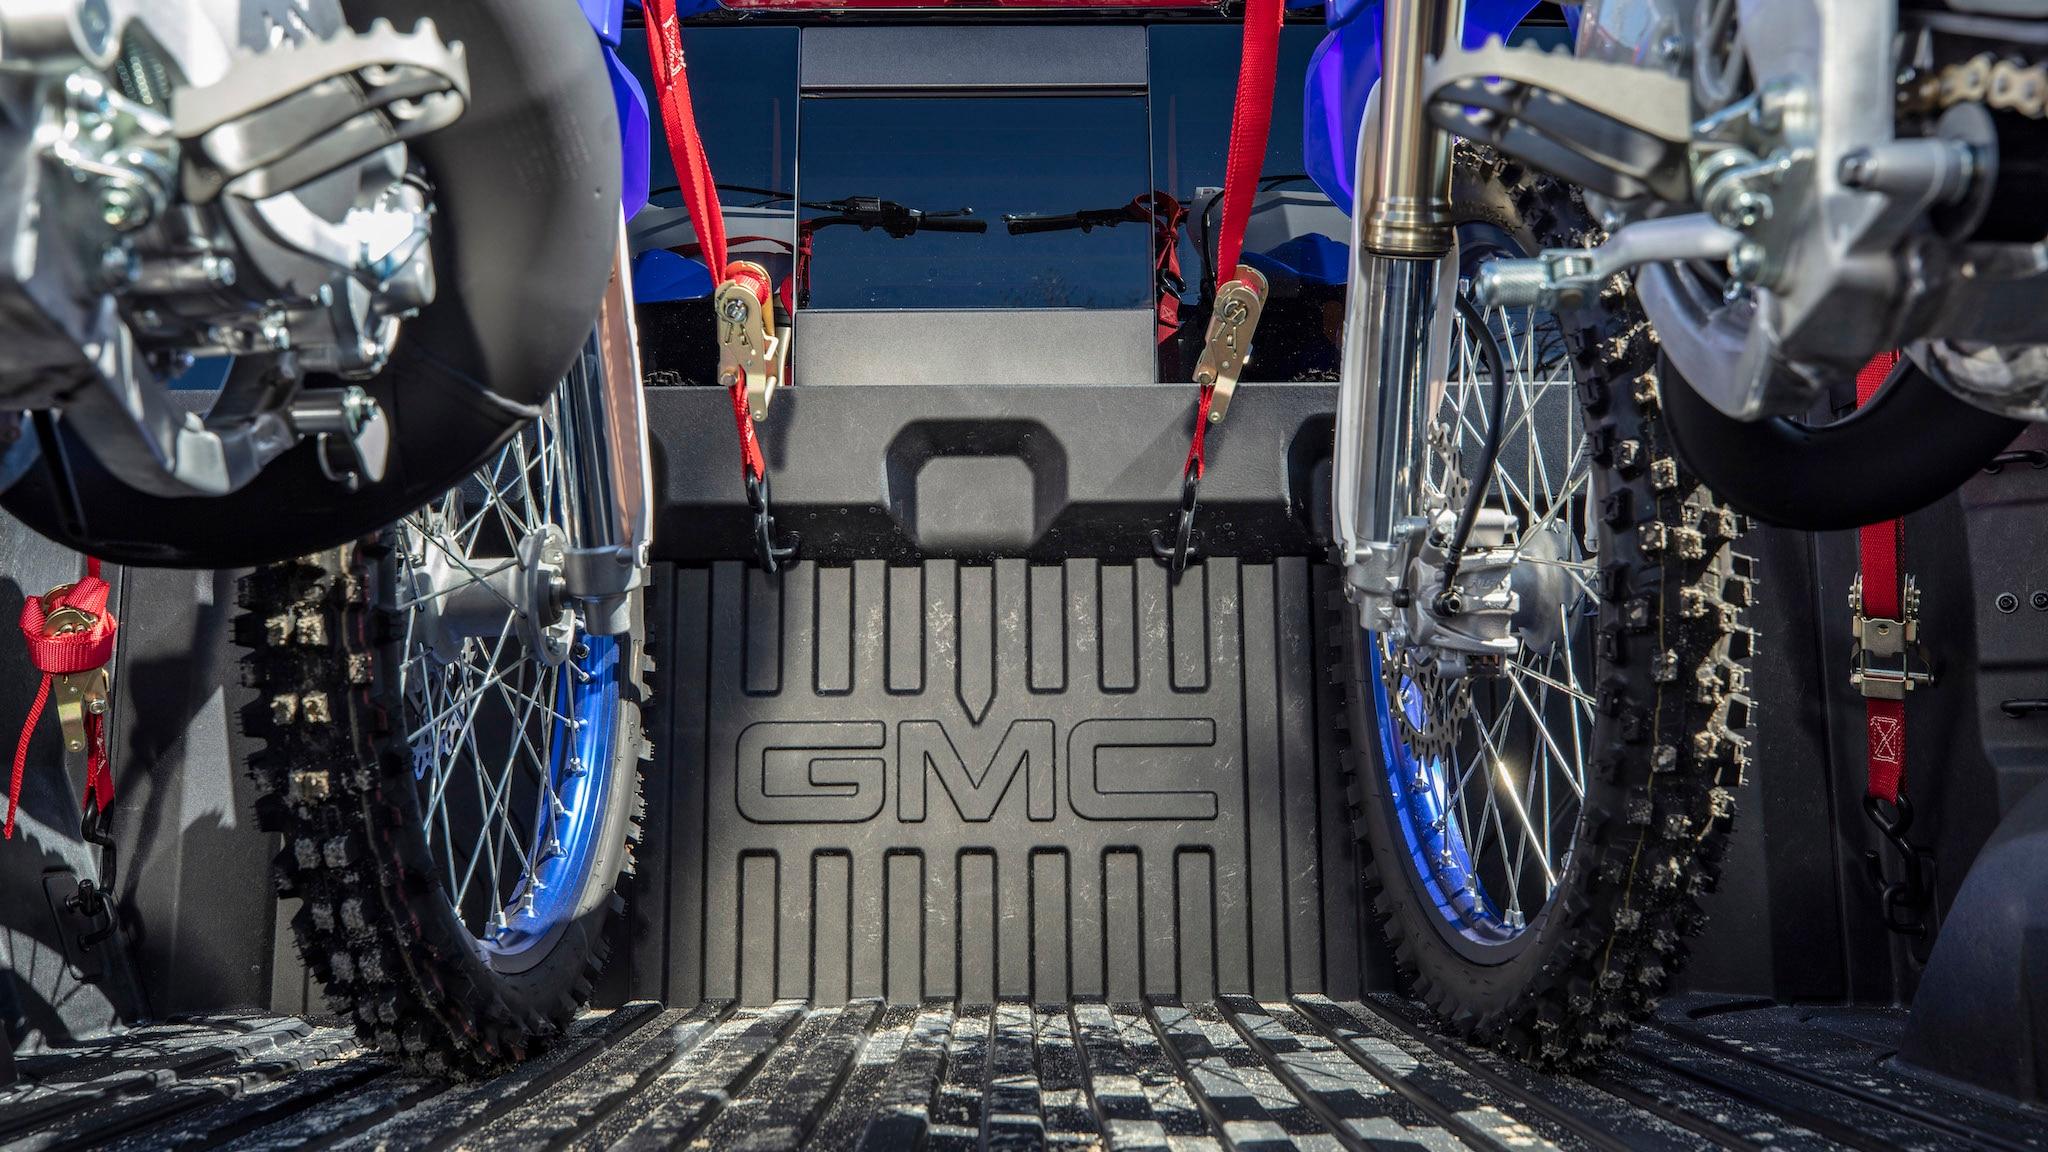 2019 GMC Sierra 1500 Denali CarbonPro Edition 15